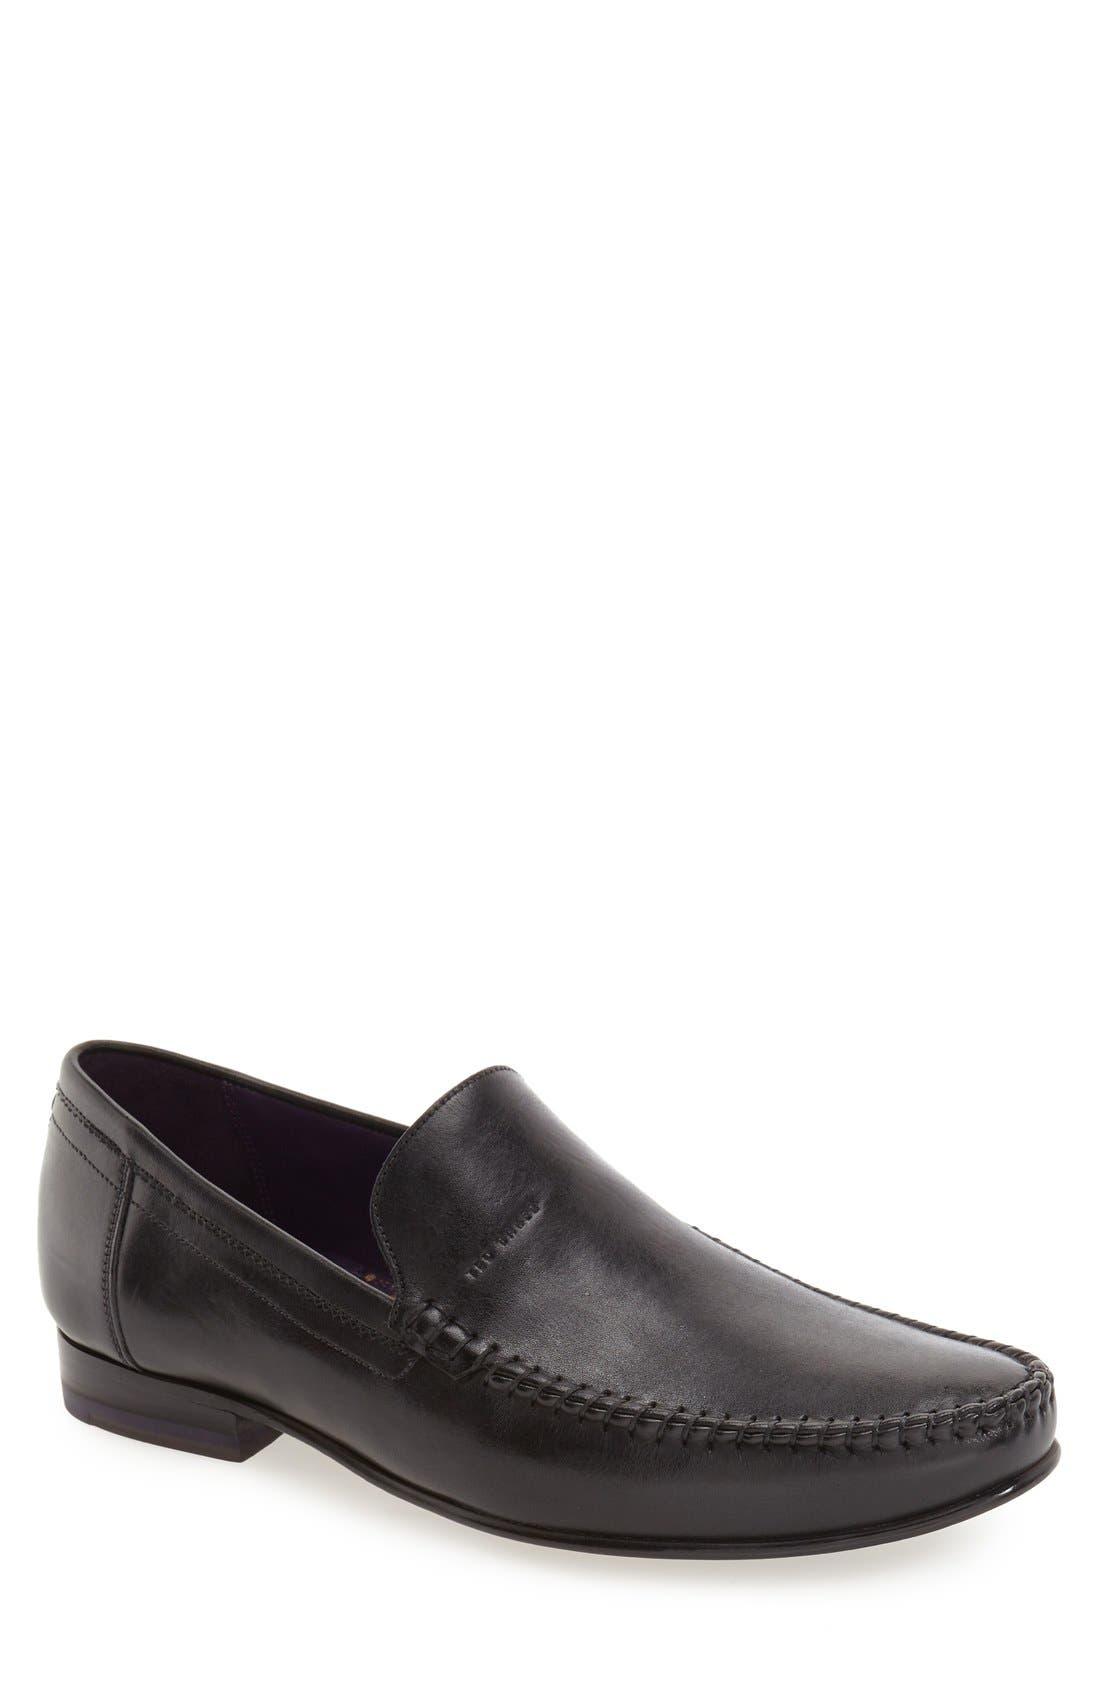 'Simeen 3' Venetian Loafer,                         Main,                         color, 001